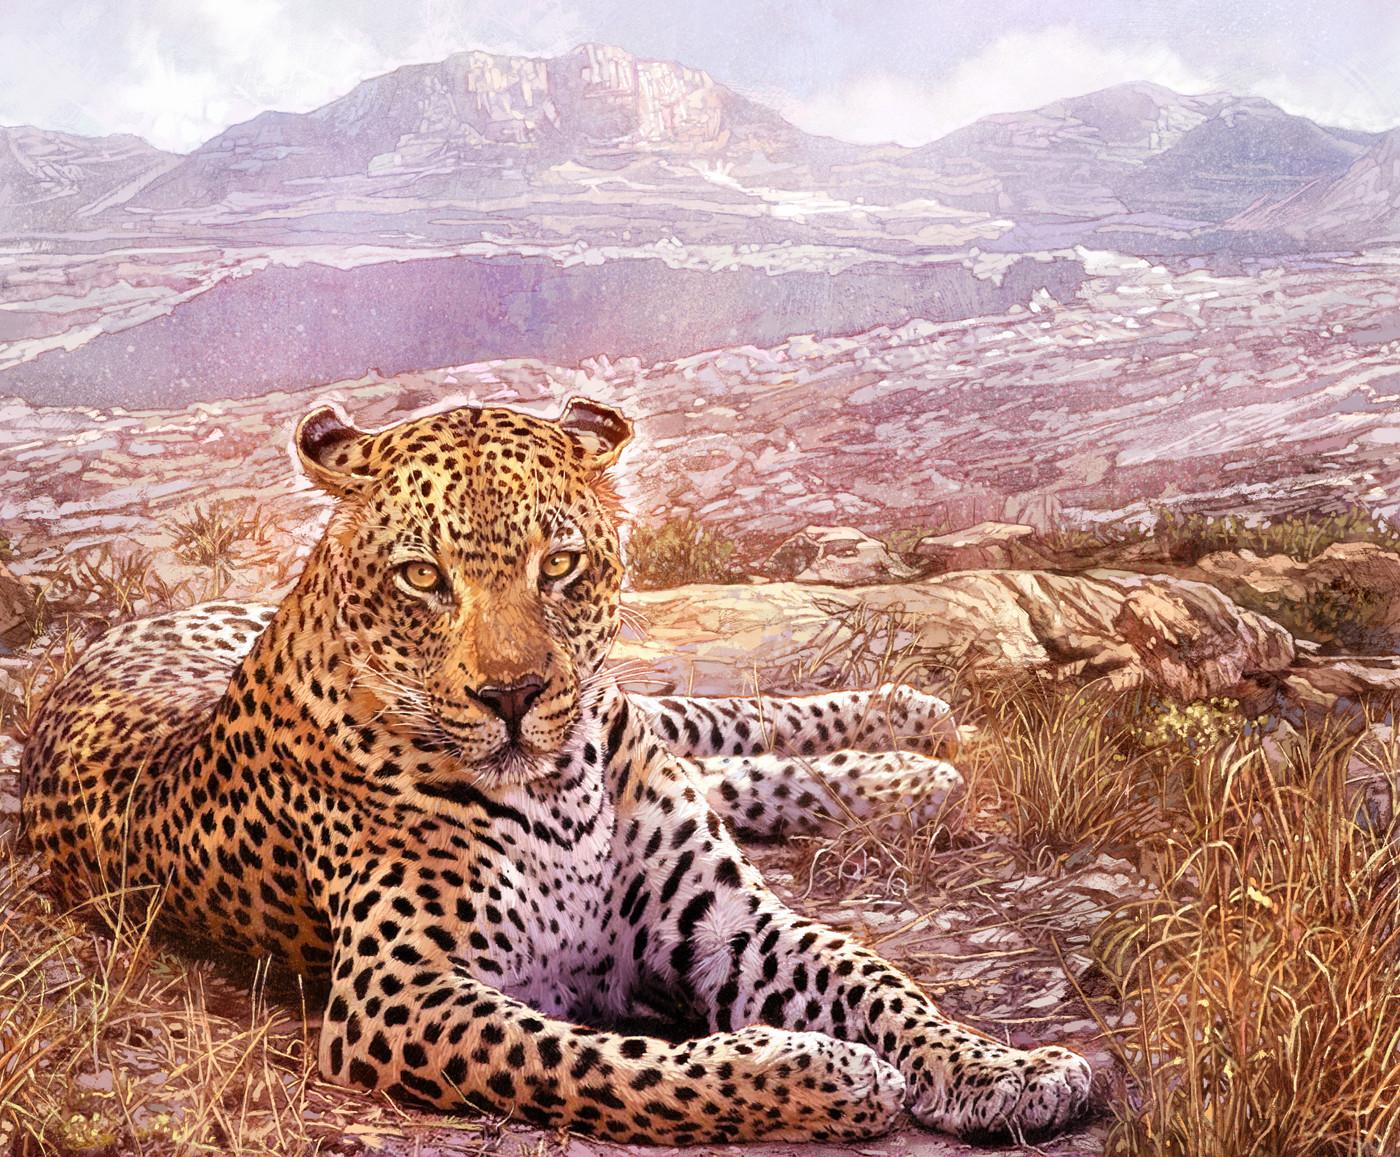 Kinsun loh leopard01